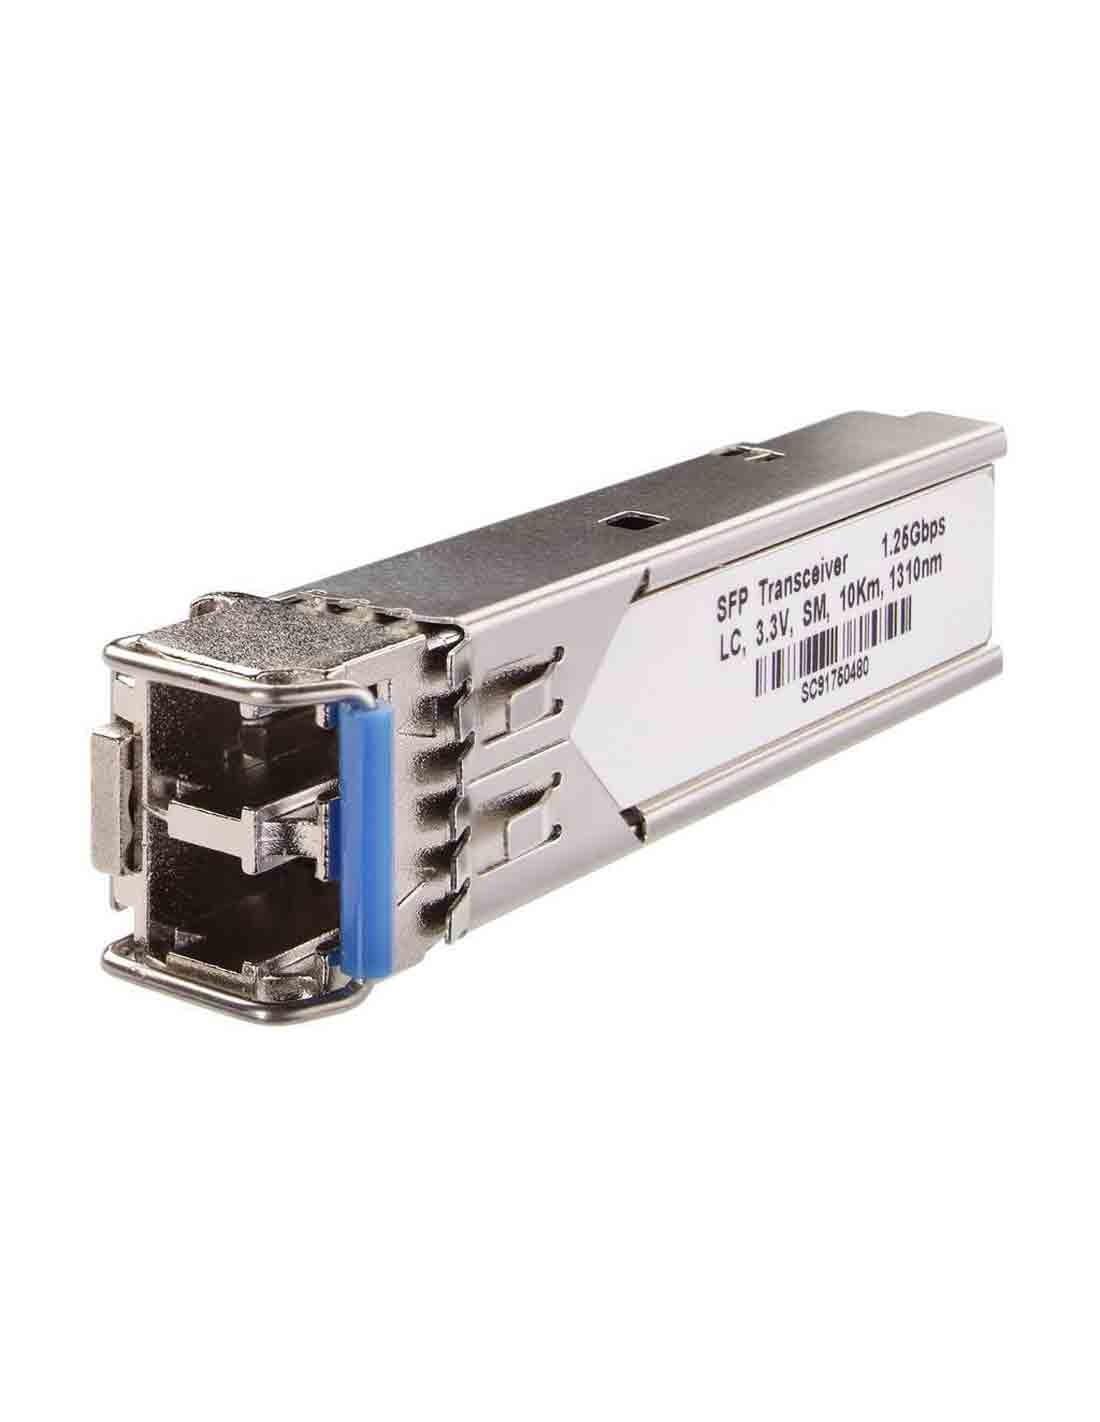 HPE X132 10G SFP+ LC LR Transceiver J9151A images